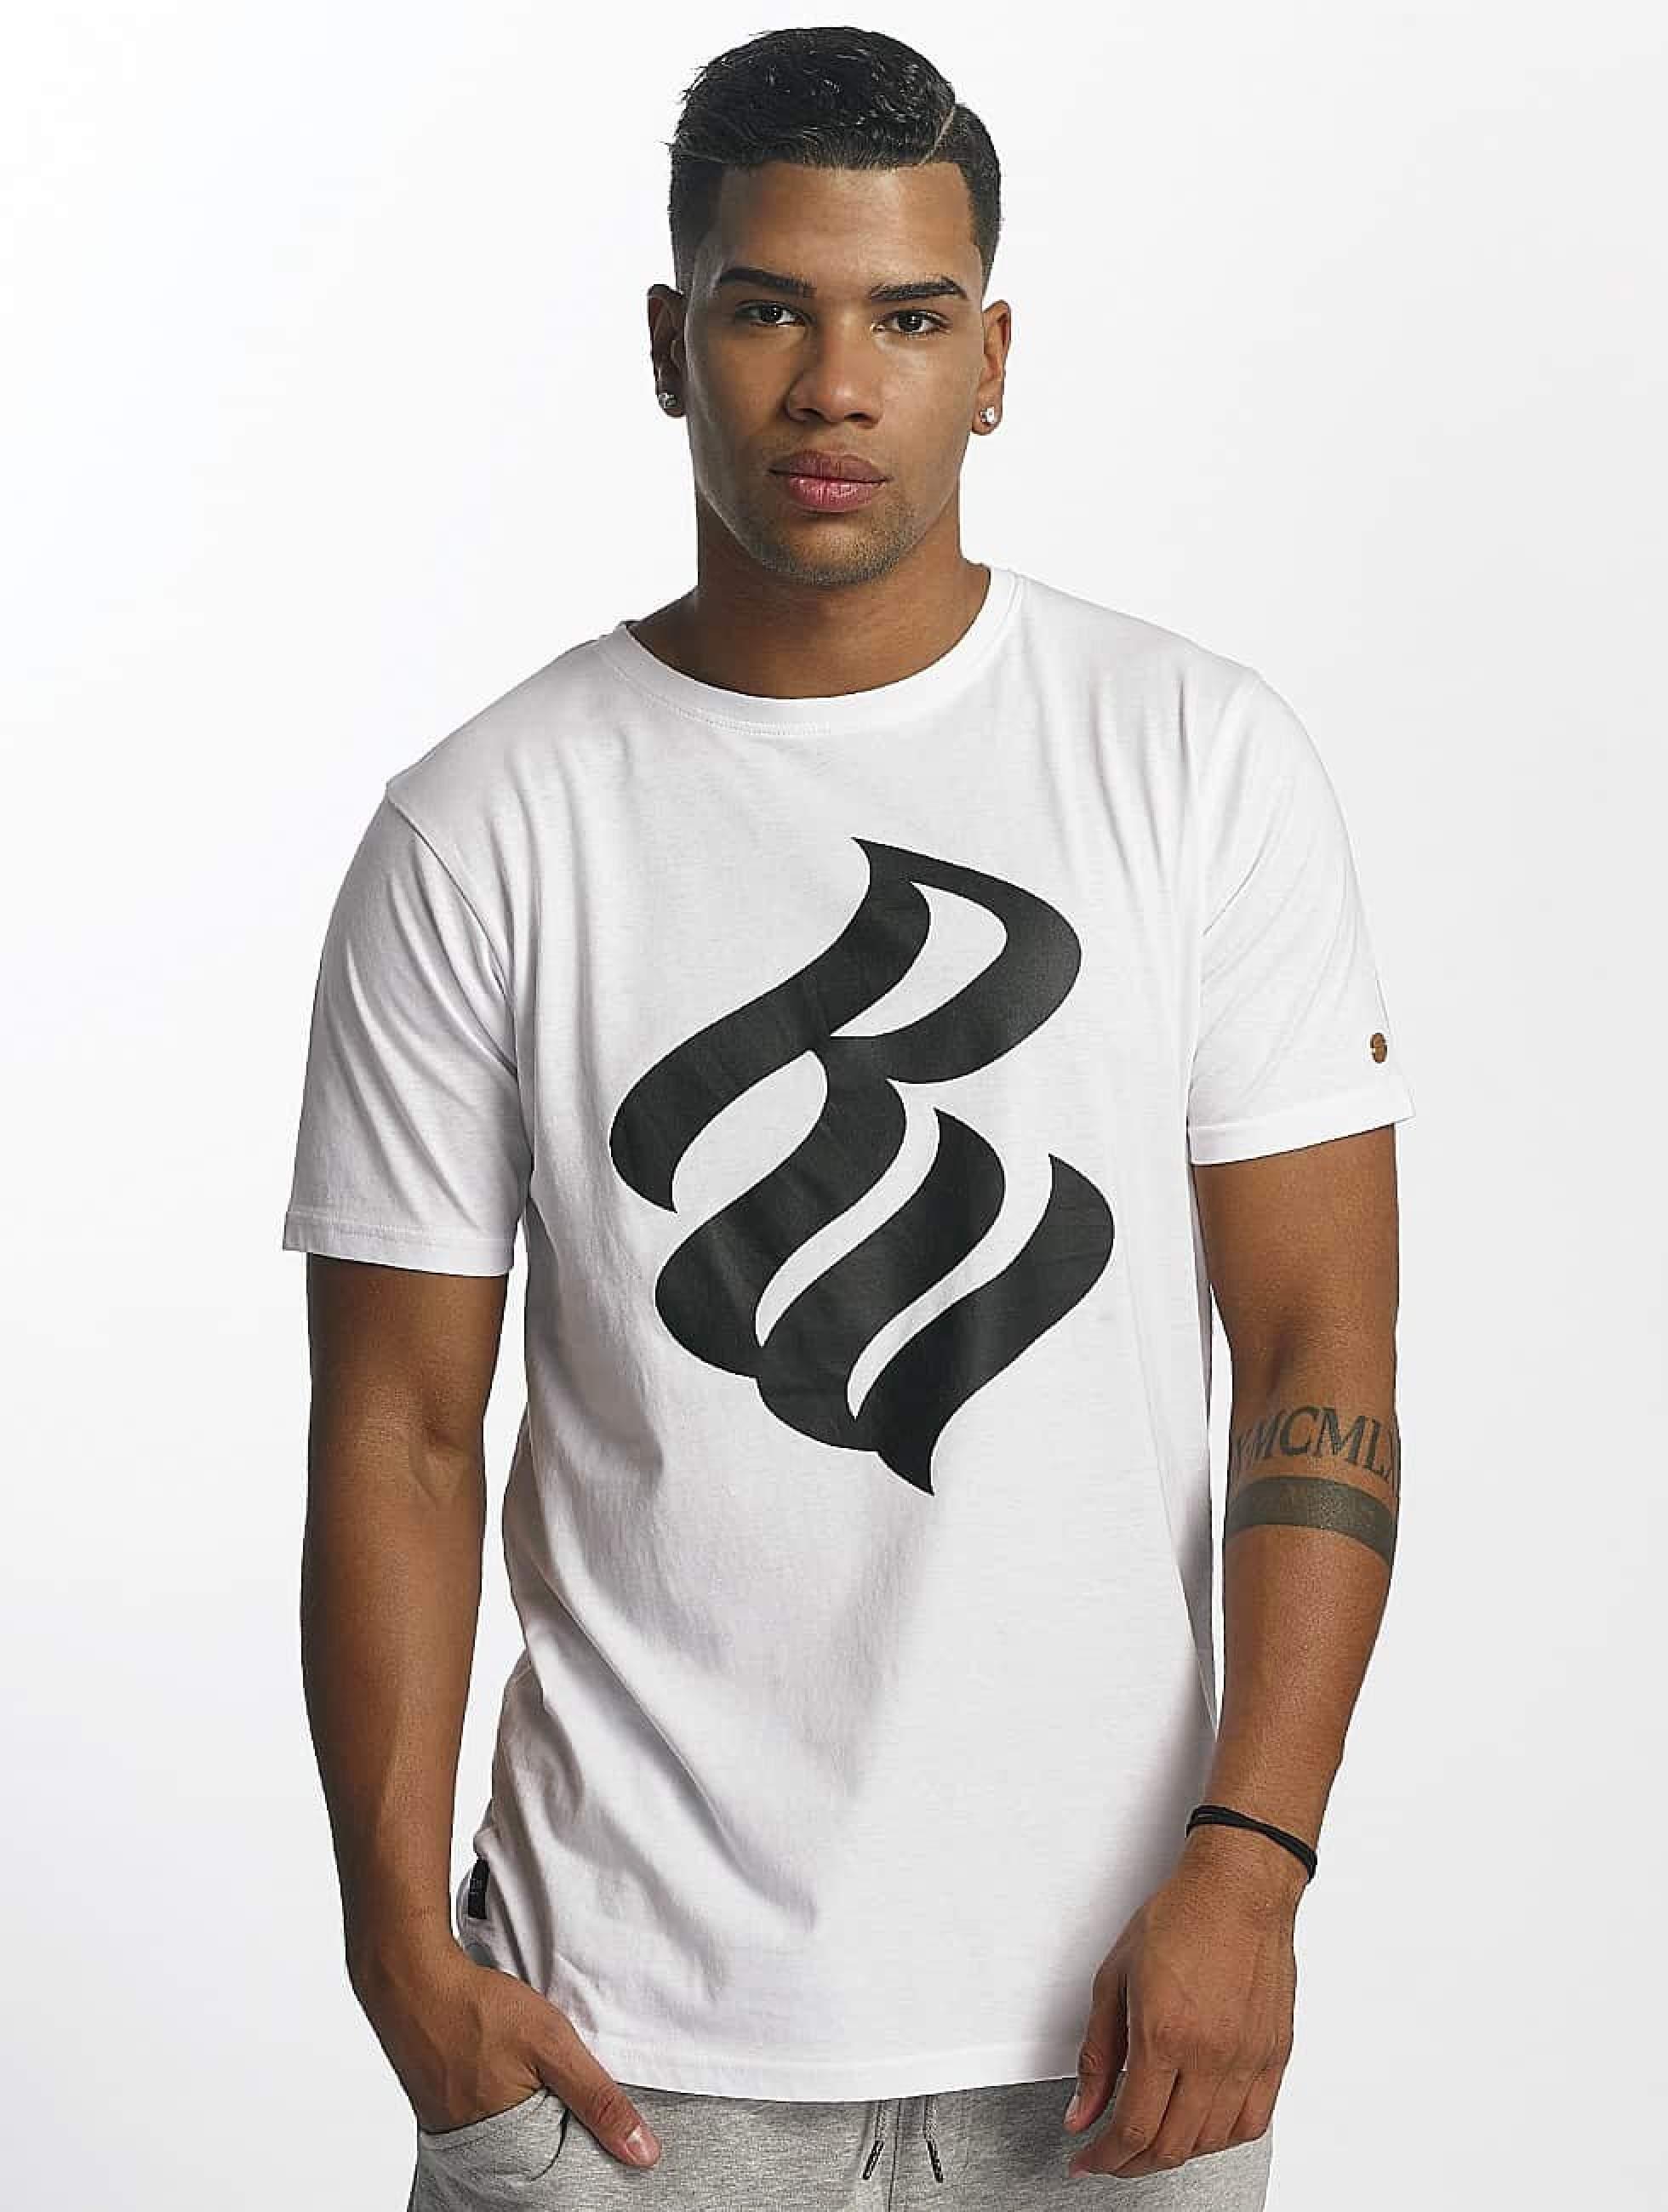 Rocawear / T-Shirt Logo in white 2XL